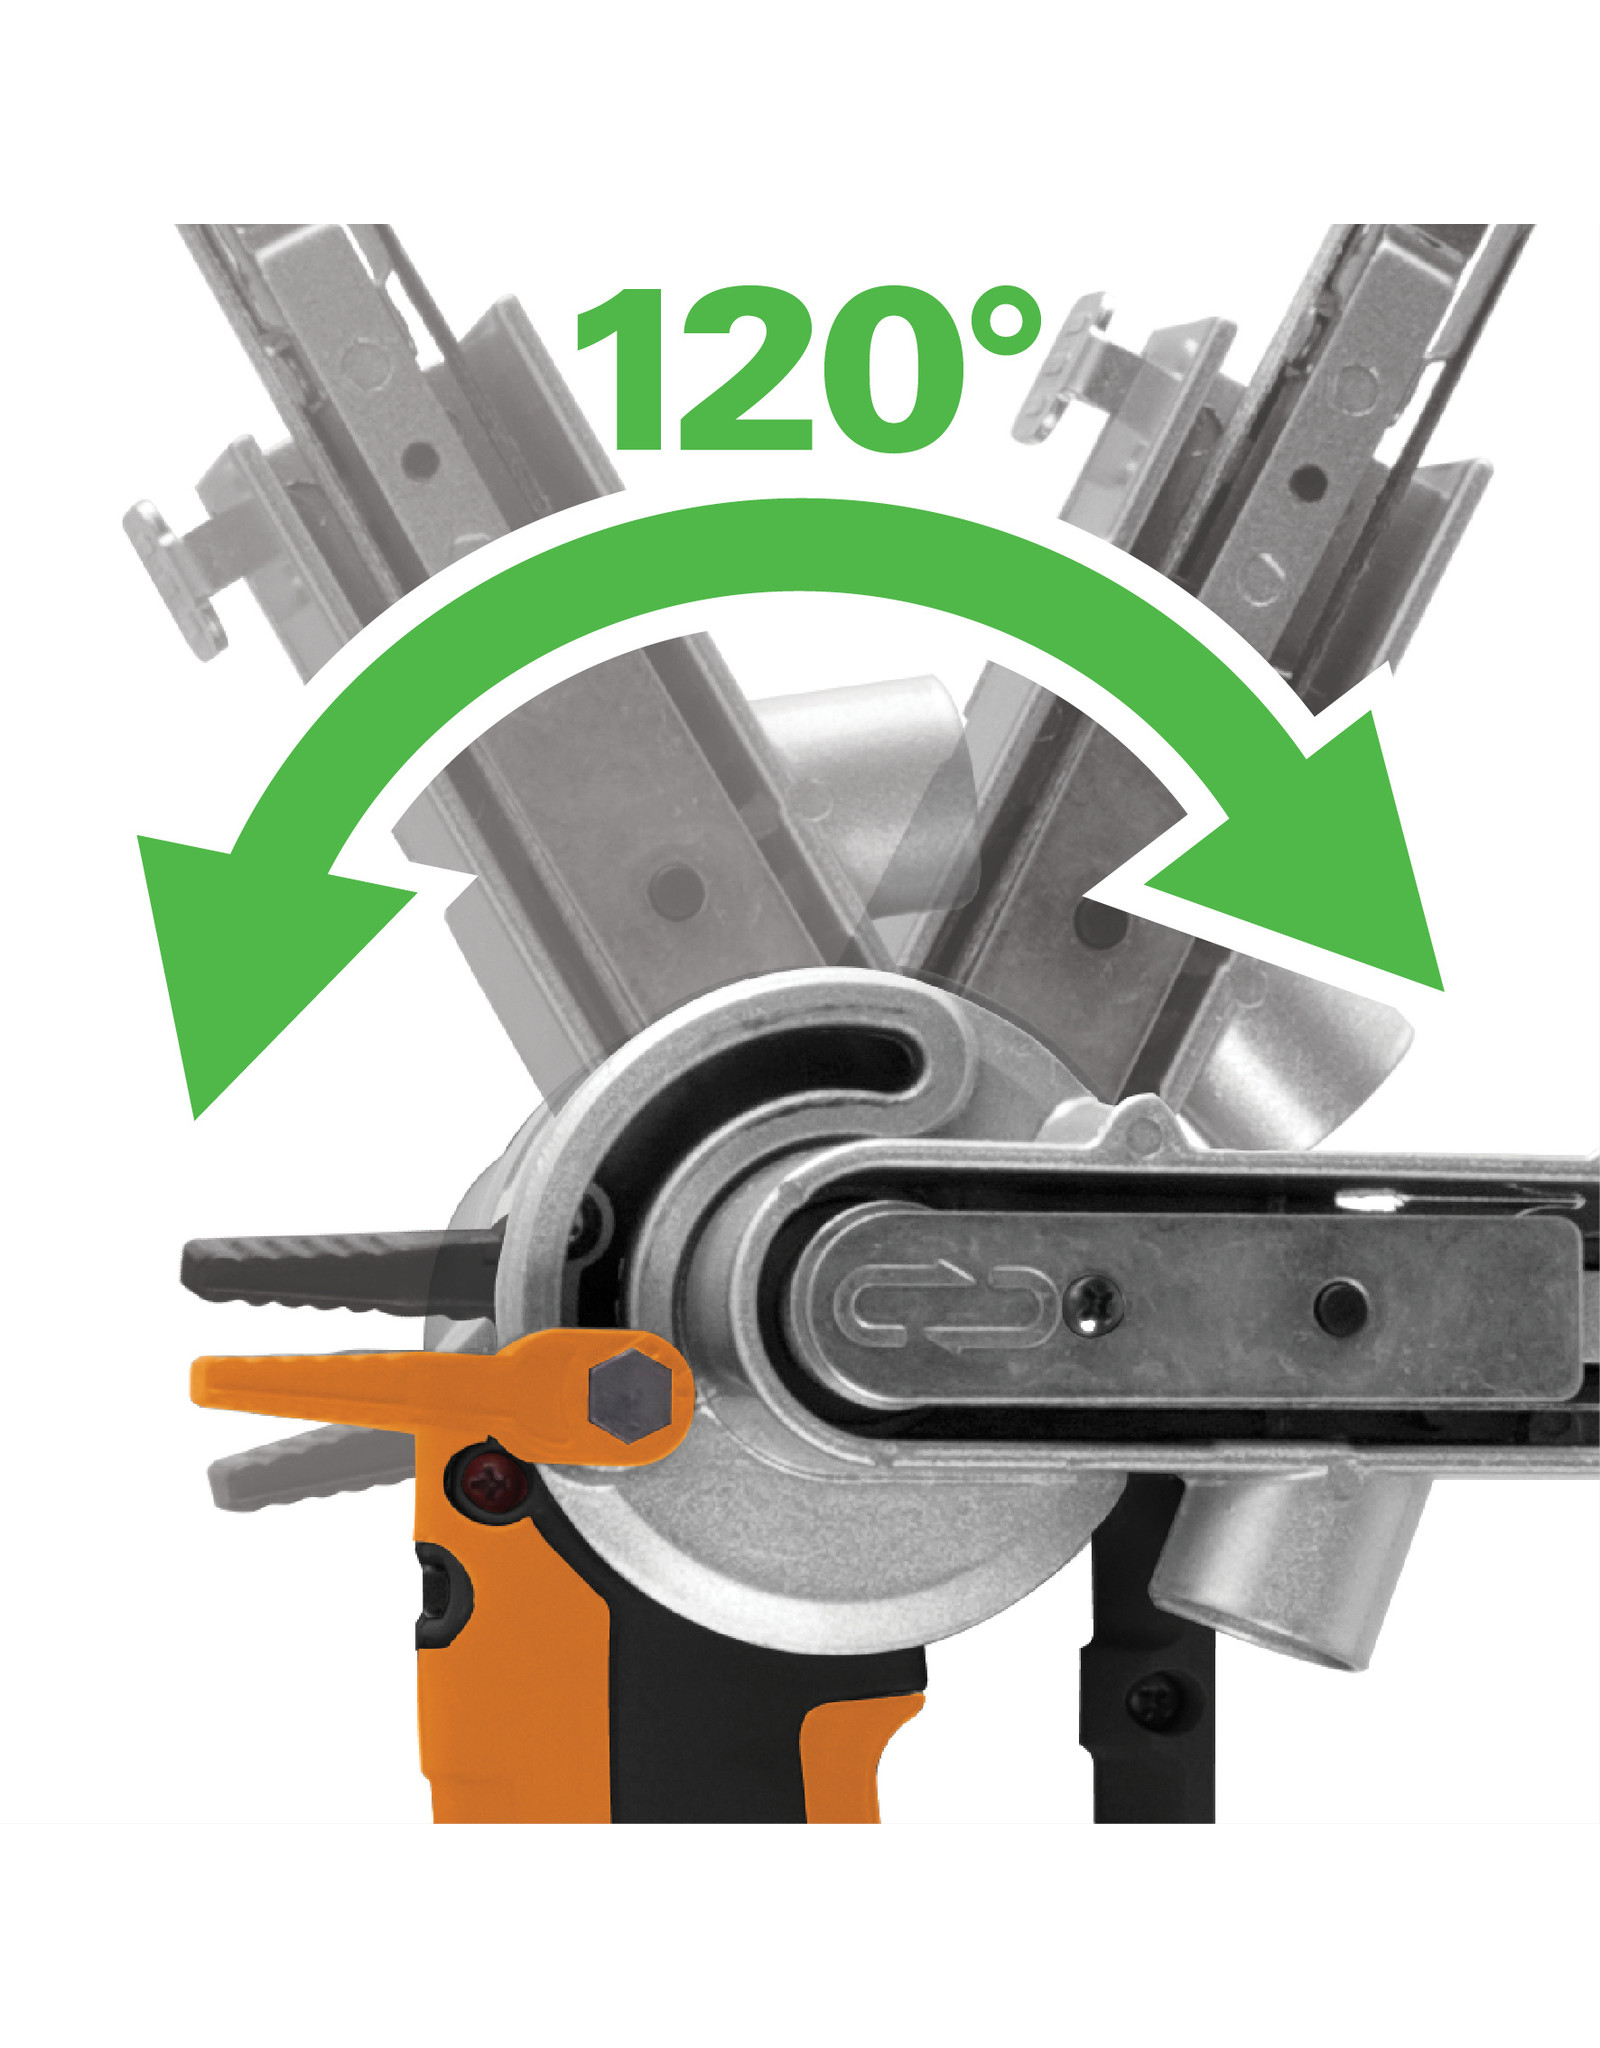 Evolution Power Tools Build Line MINI PRECISION SANDER